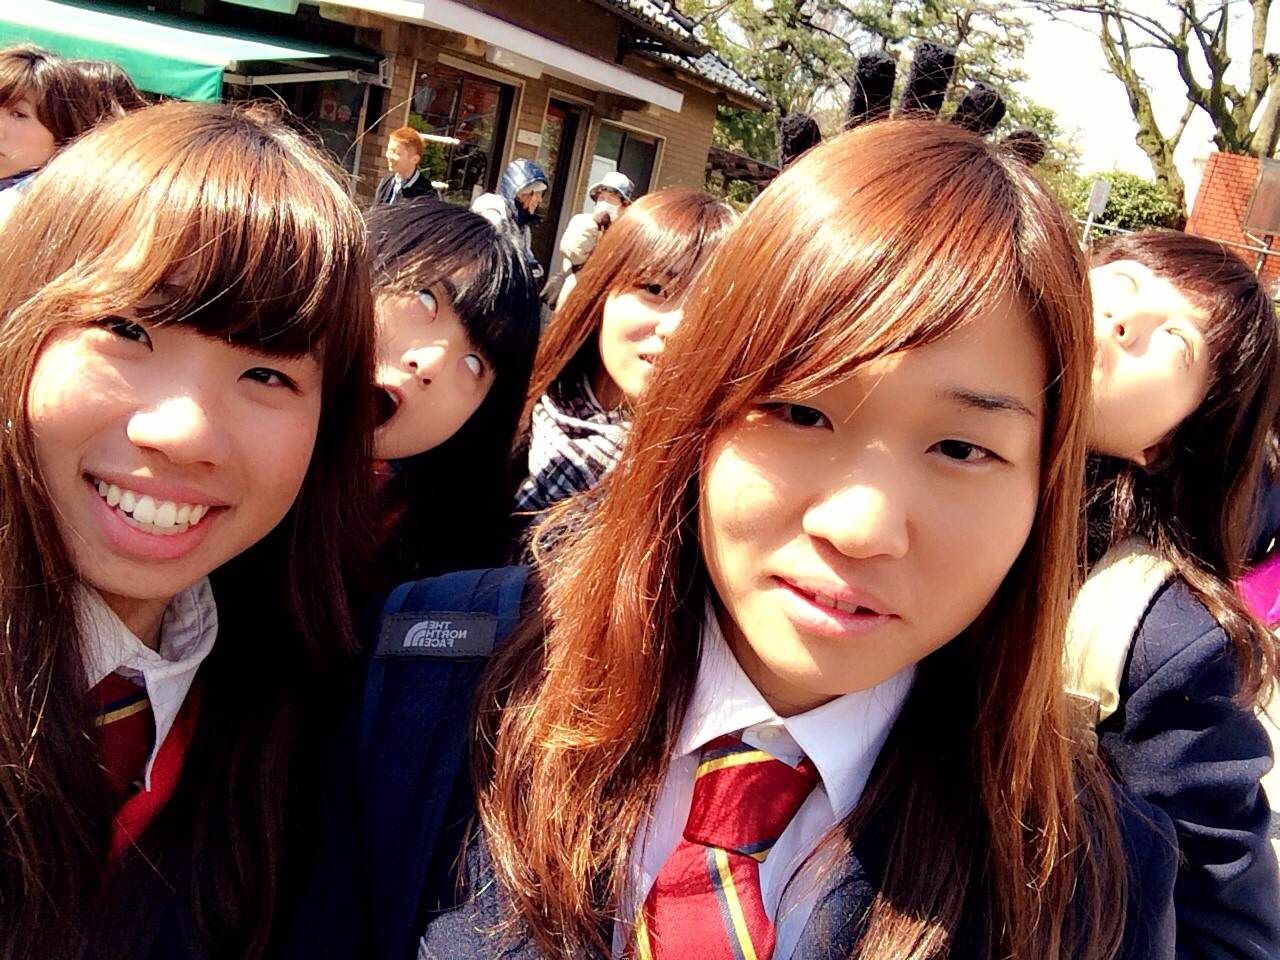 photo3 (1).jpg